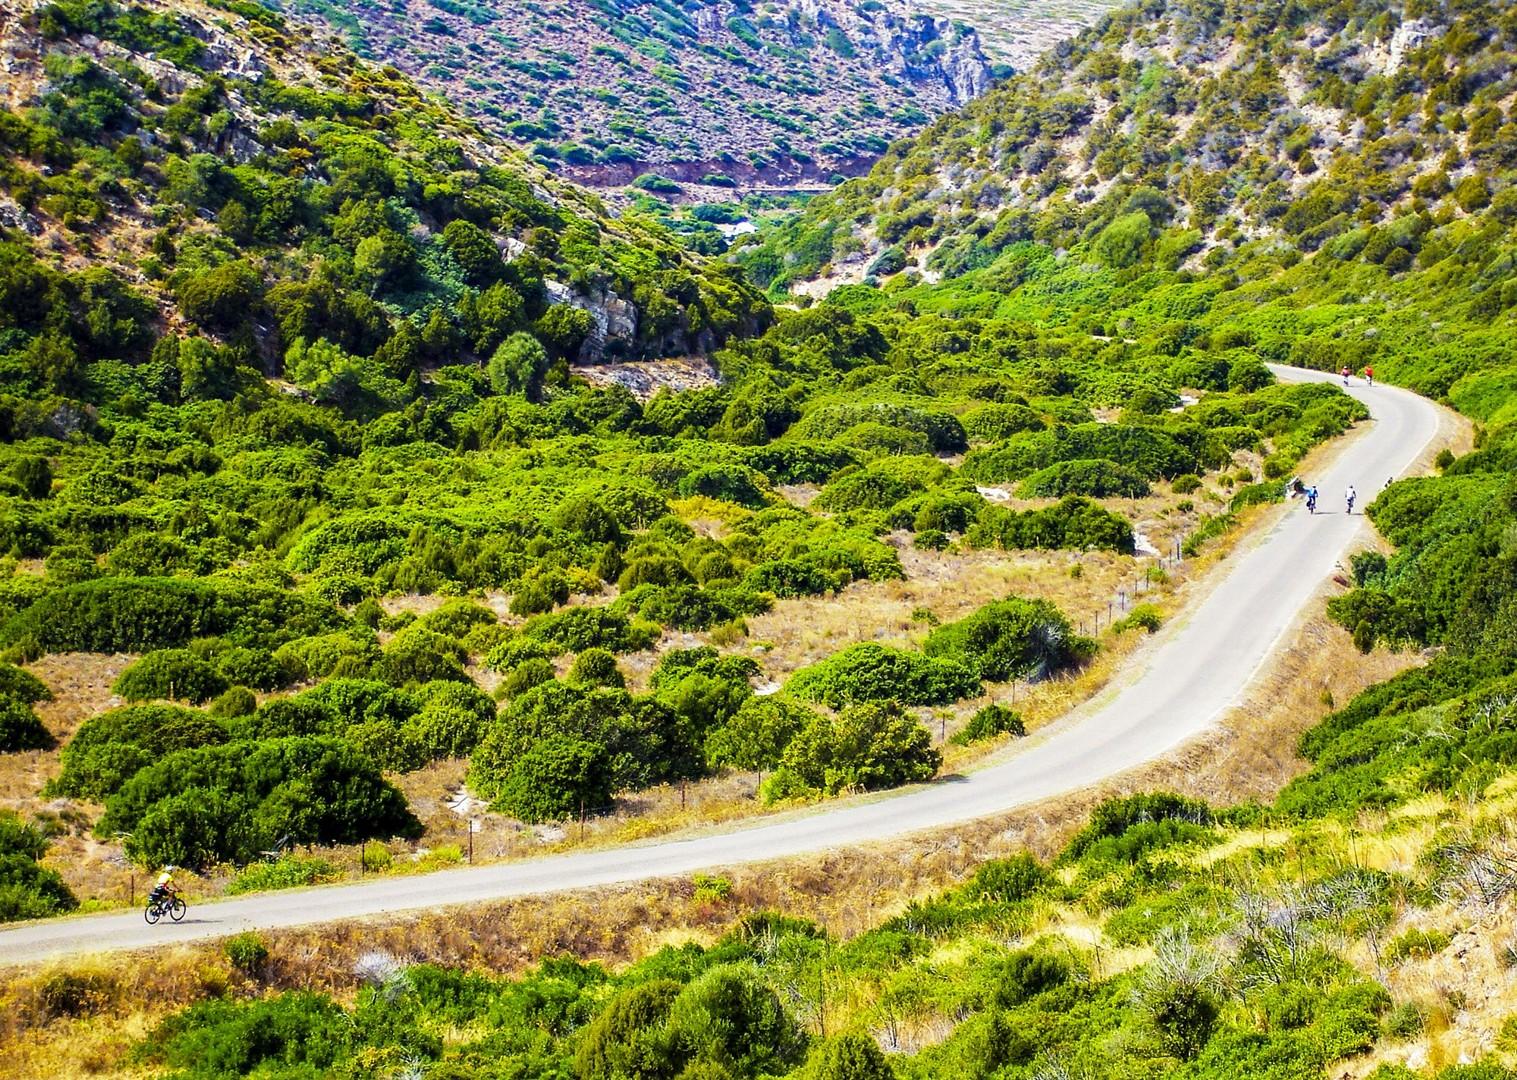 italy-sardinian-island-trip-leisure-cycling-holiday-skedaddle.jpg - Italy - Sardinia - Island Flavours - Self-Guided Leisure Cycling Holiday - Italia Leisure and Family Cycling